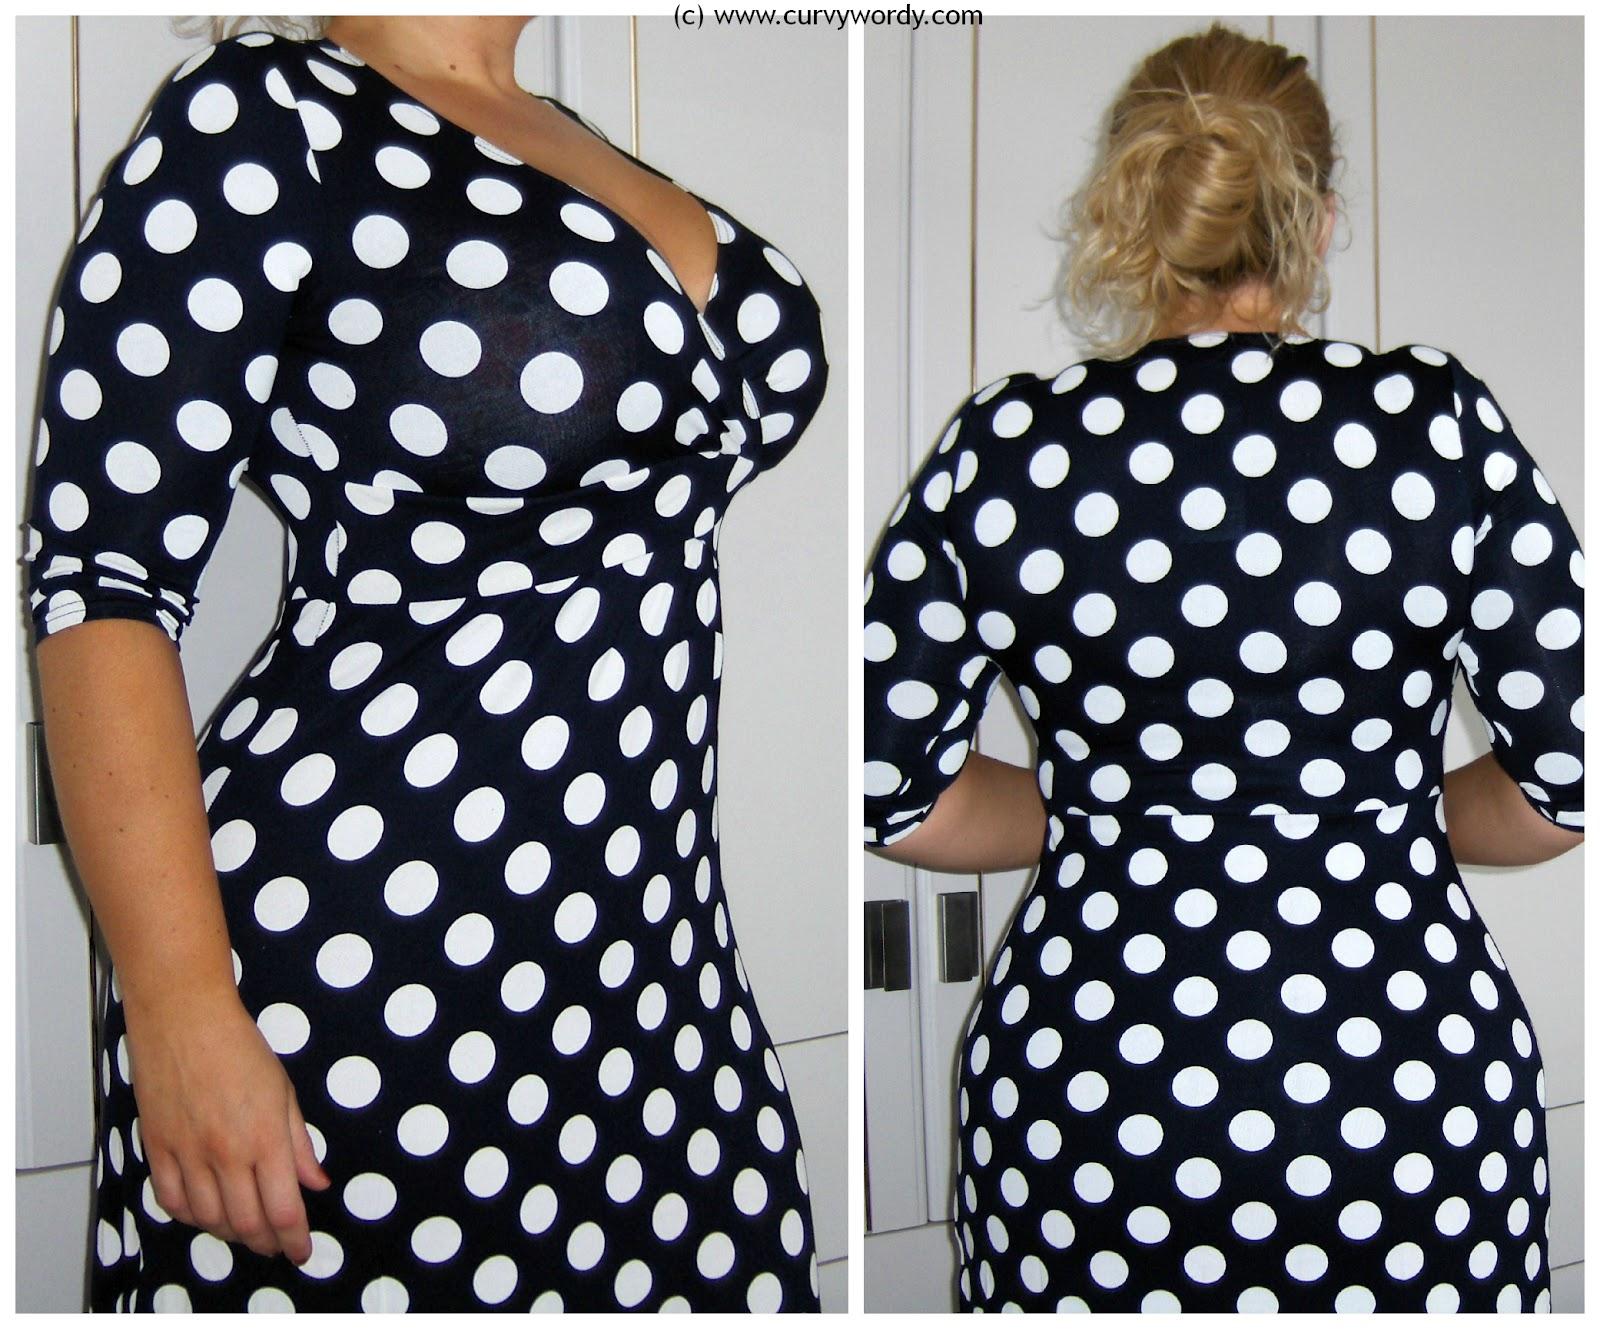 b890af48962 Roman Originals Polka Dot Dress - Curvy Wordy